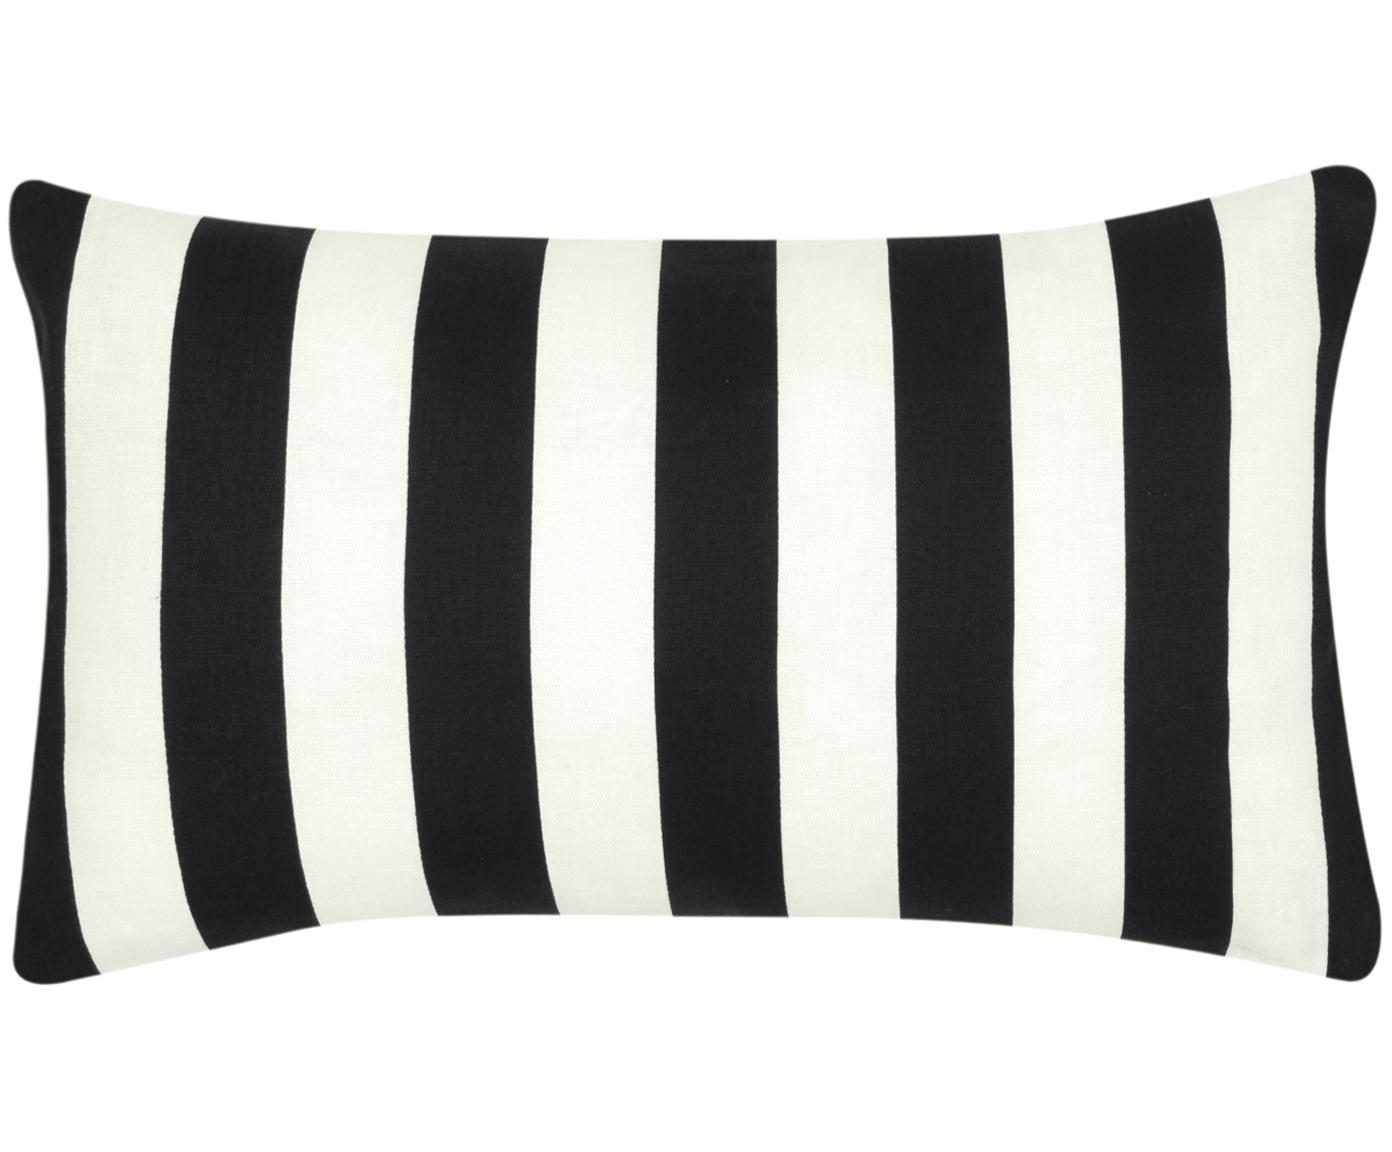 Kussenhoes Timon, 100% katoen, Zwart, wit, 30 x 50 cm